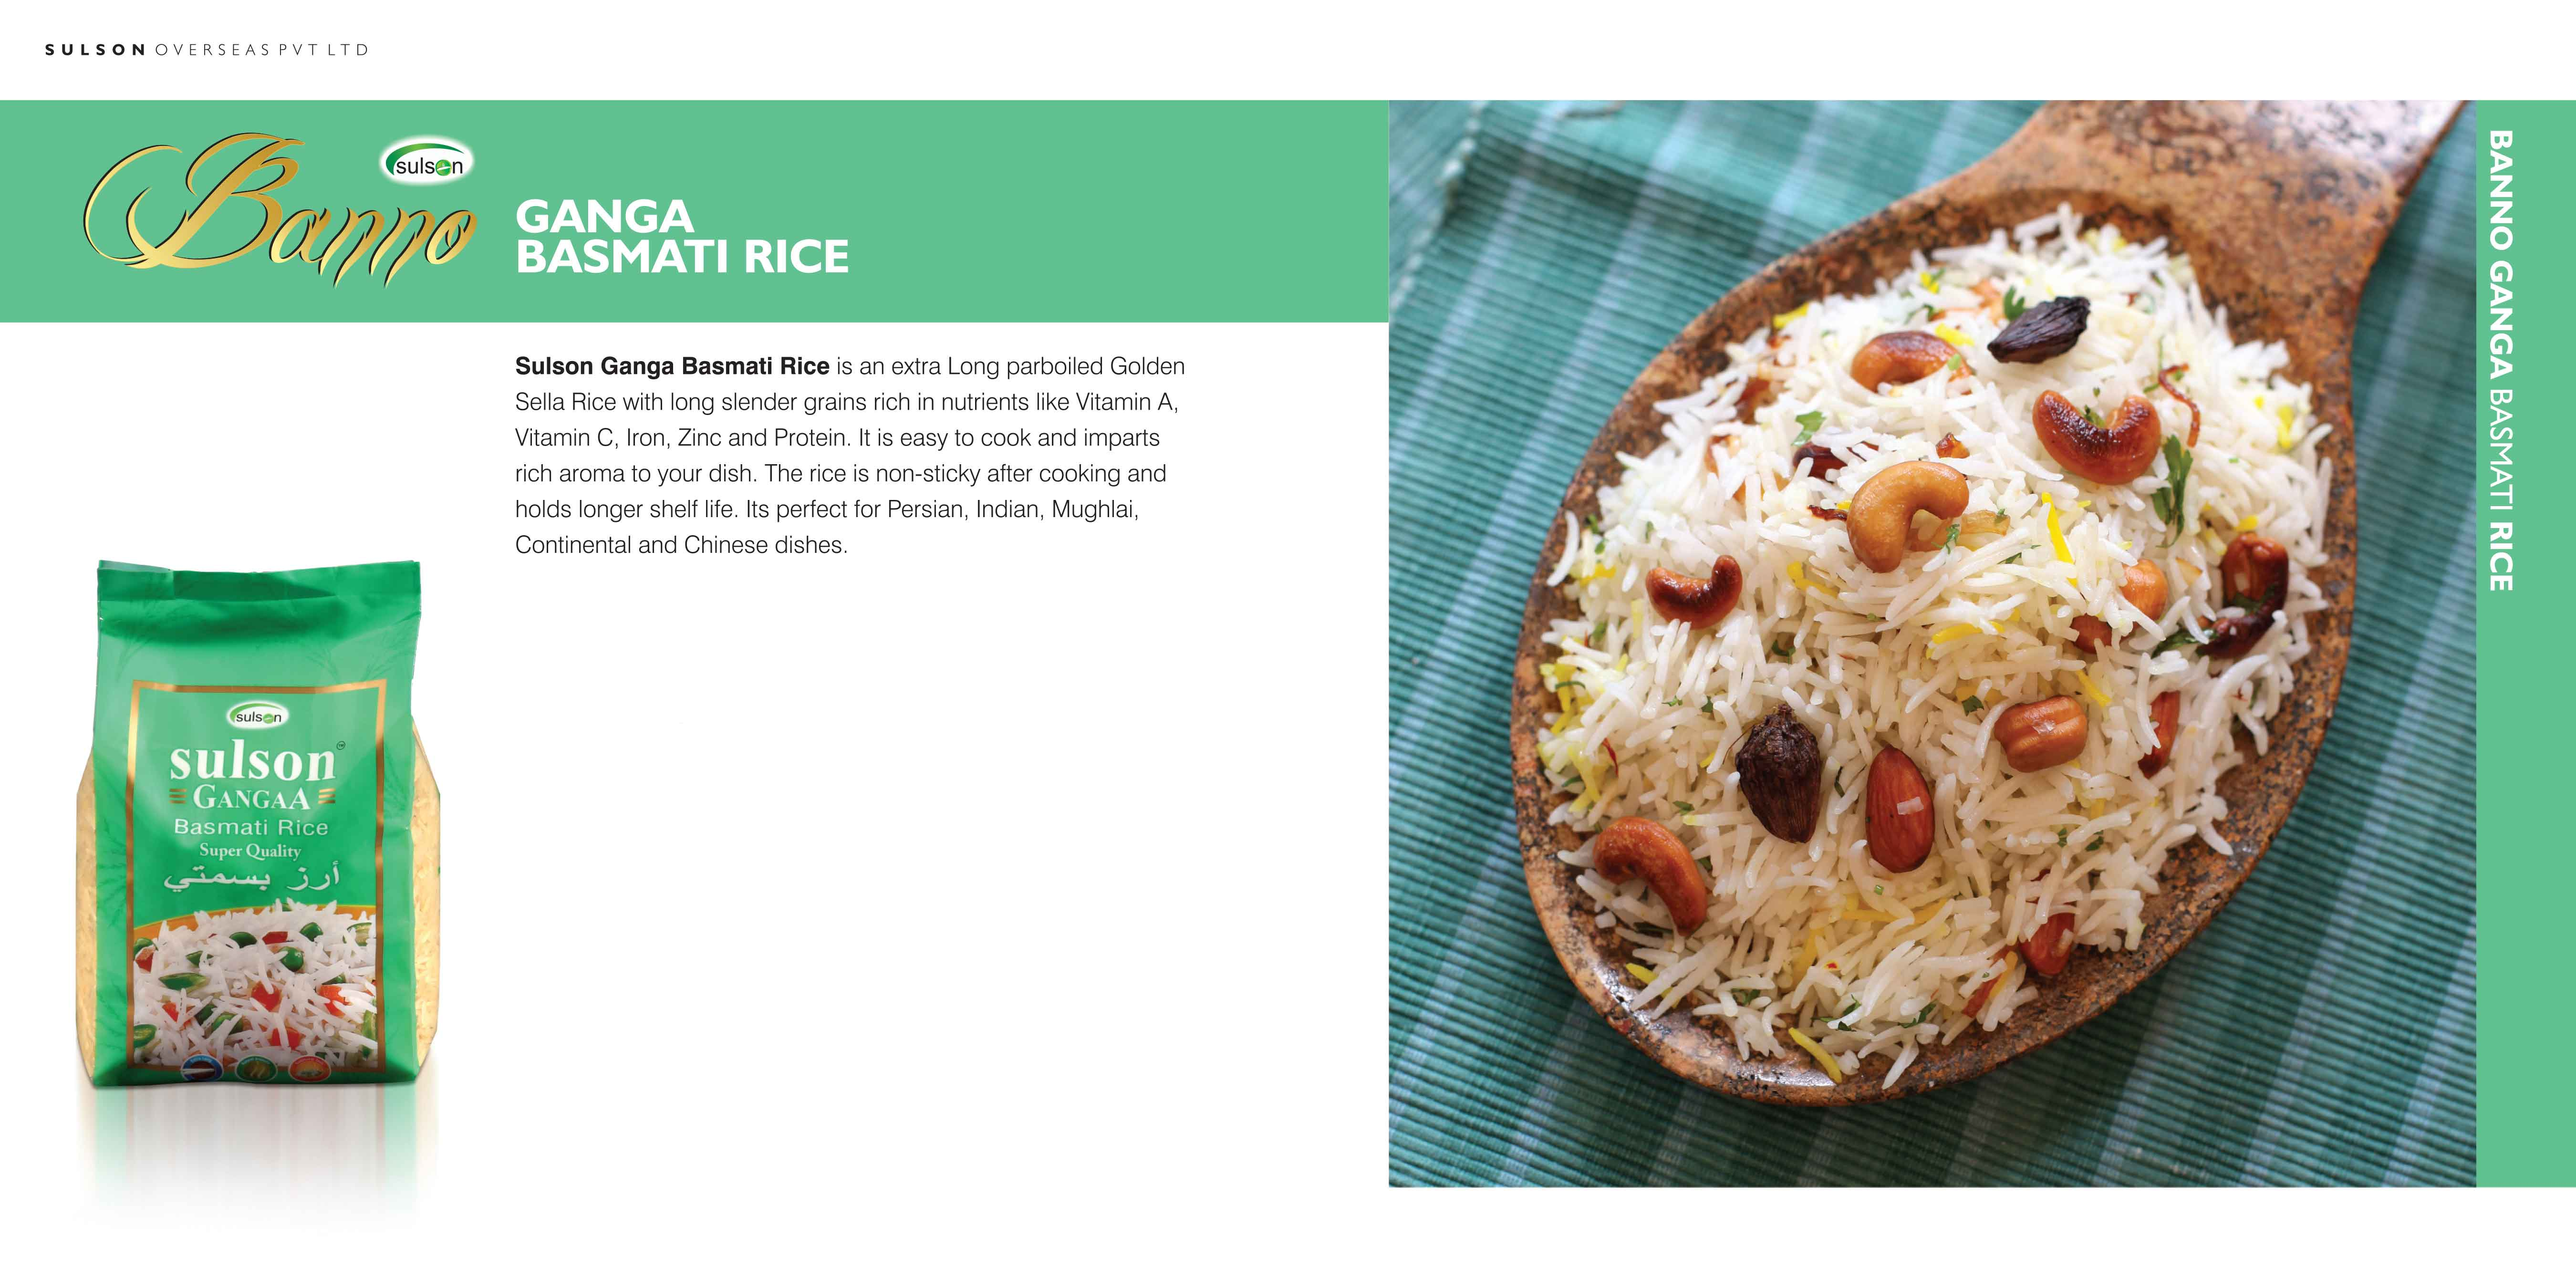 Sulson-ganga-Basmati-Rice